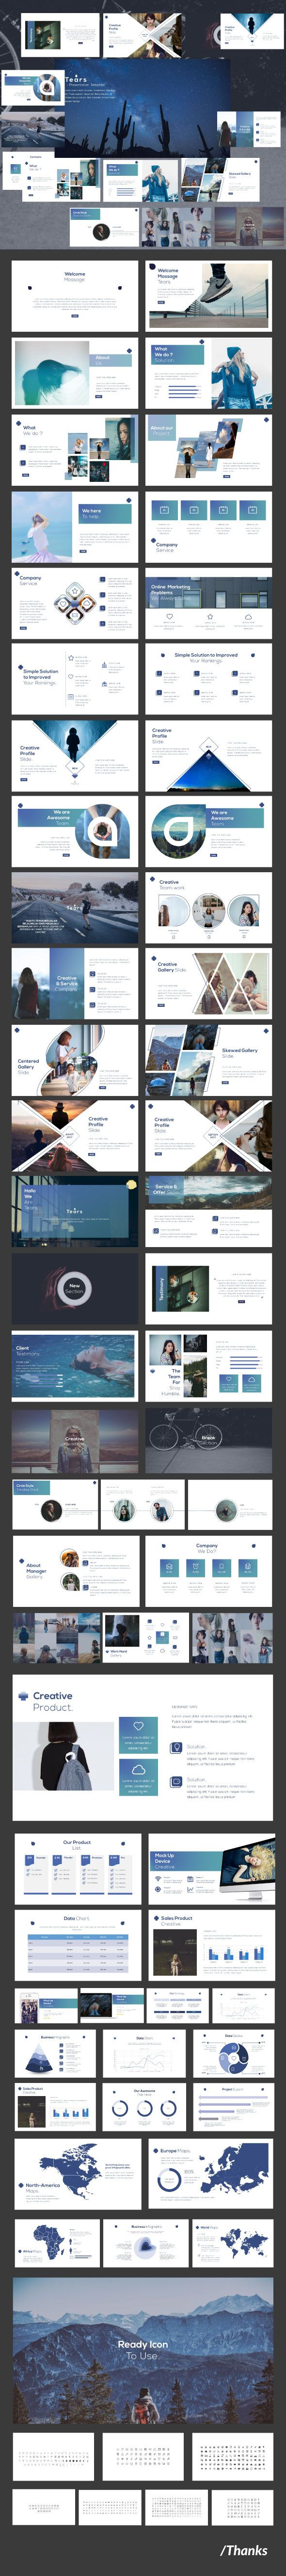 Tears - Multipurpose Presentation Template - Creative PowerPoint Templates